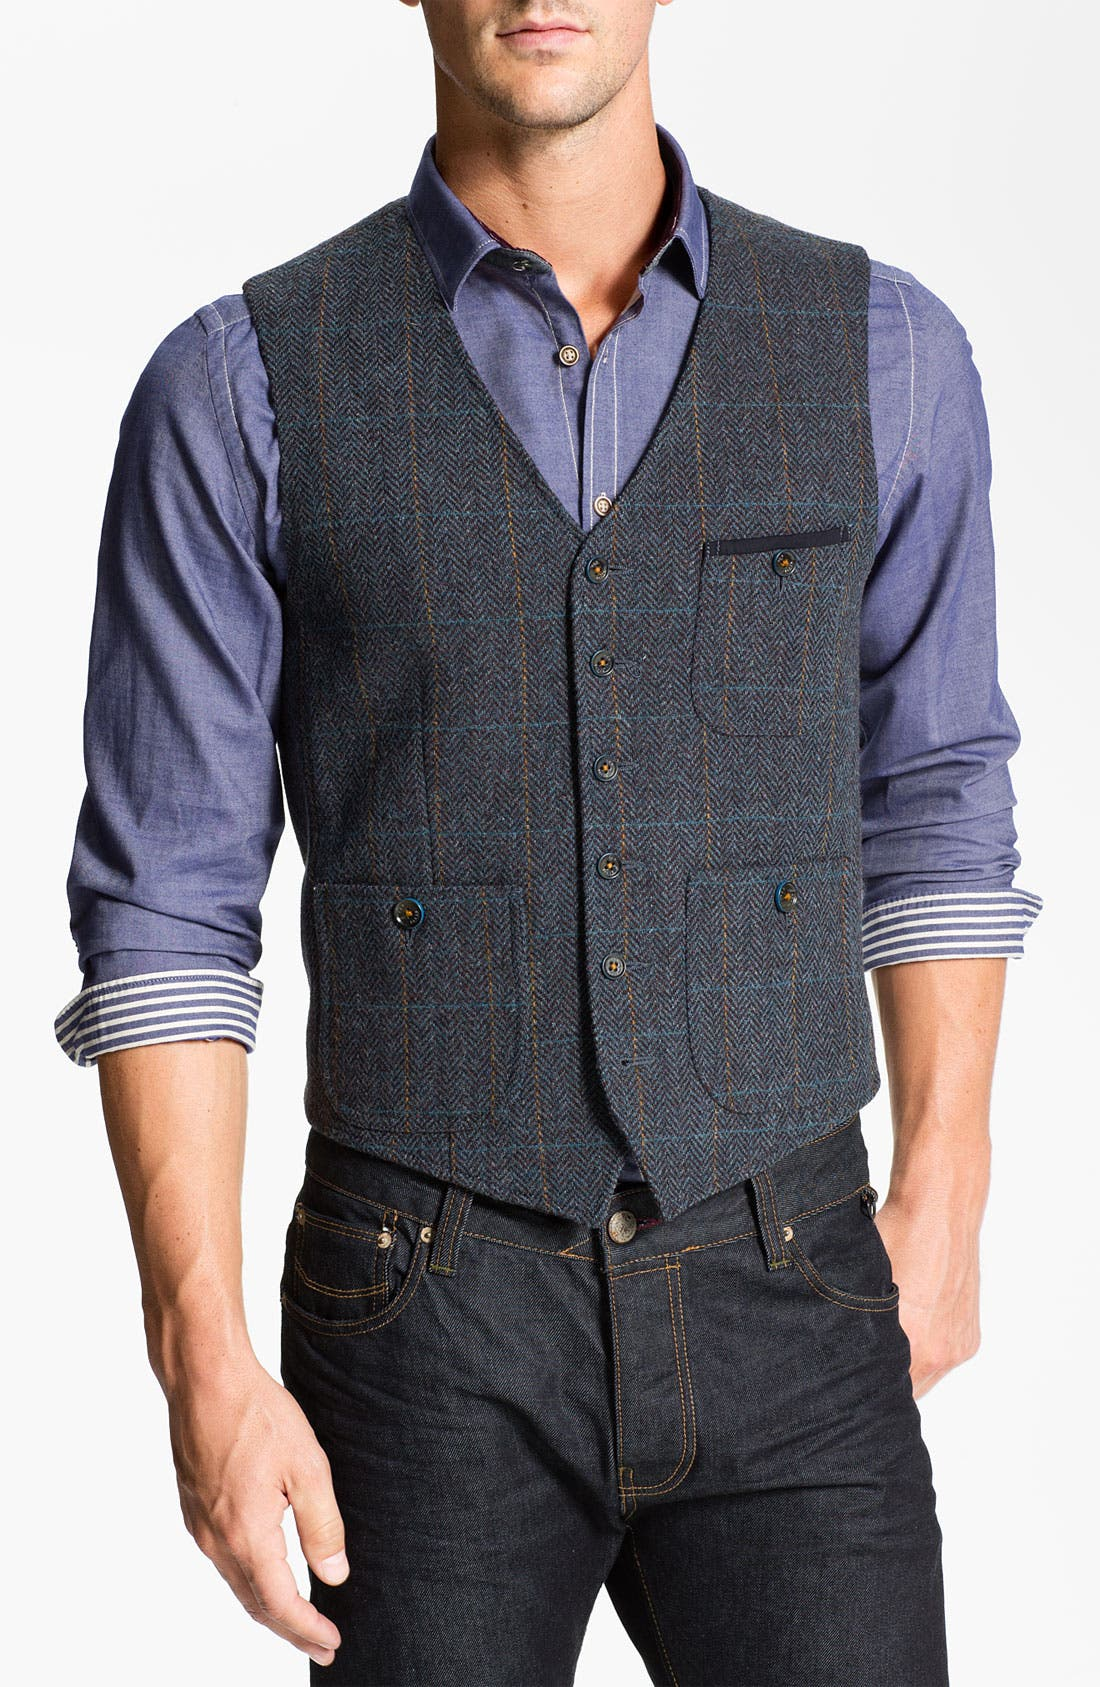 Alternate Image 1 Selected - Ted Baker London 'Rythwai' Wool Waistcoat